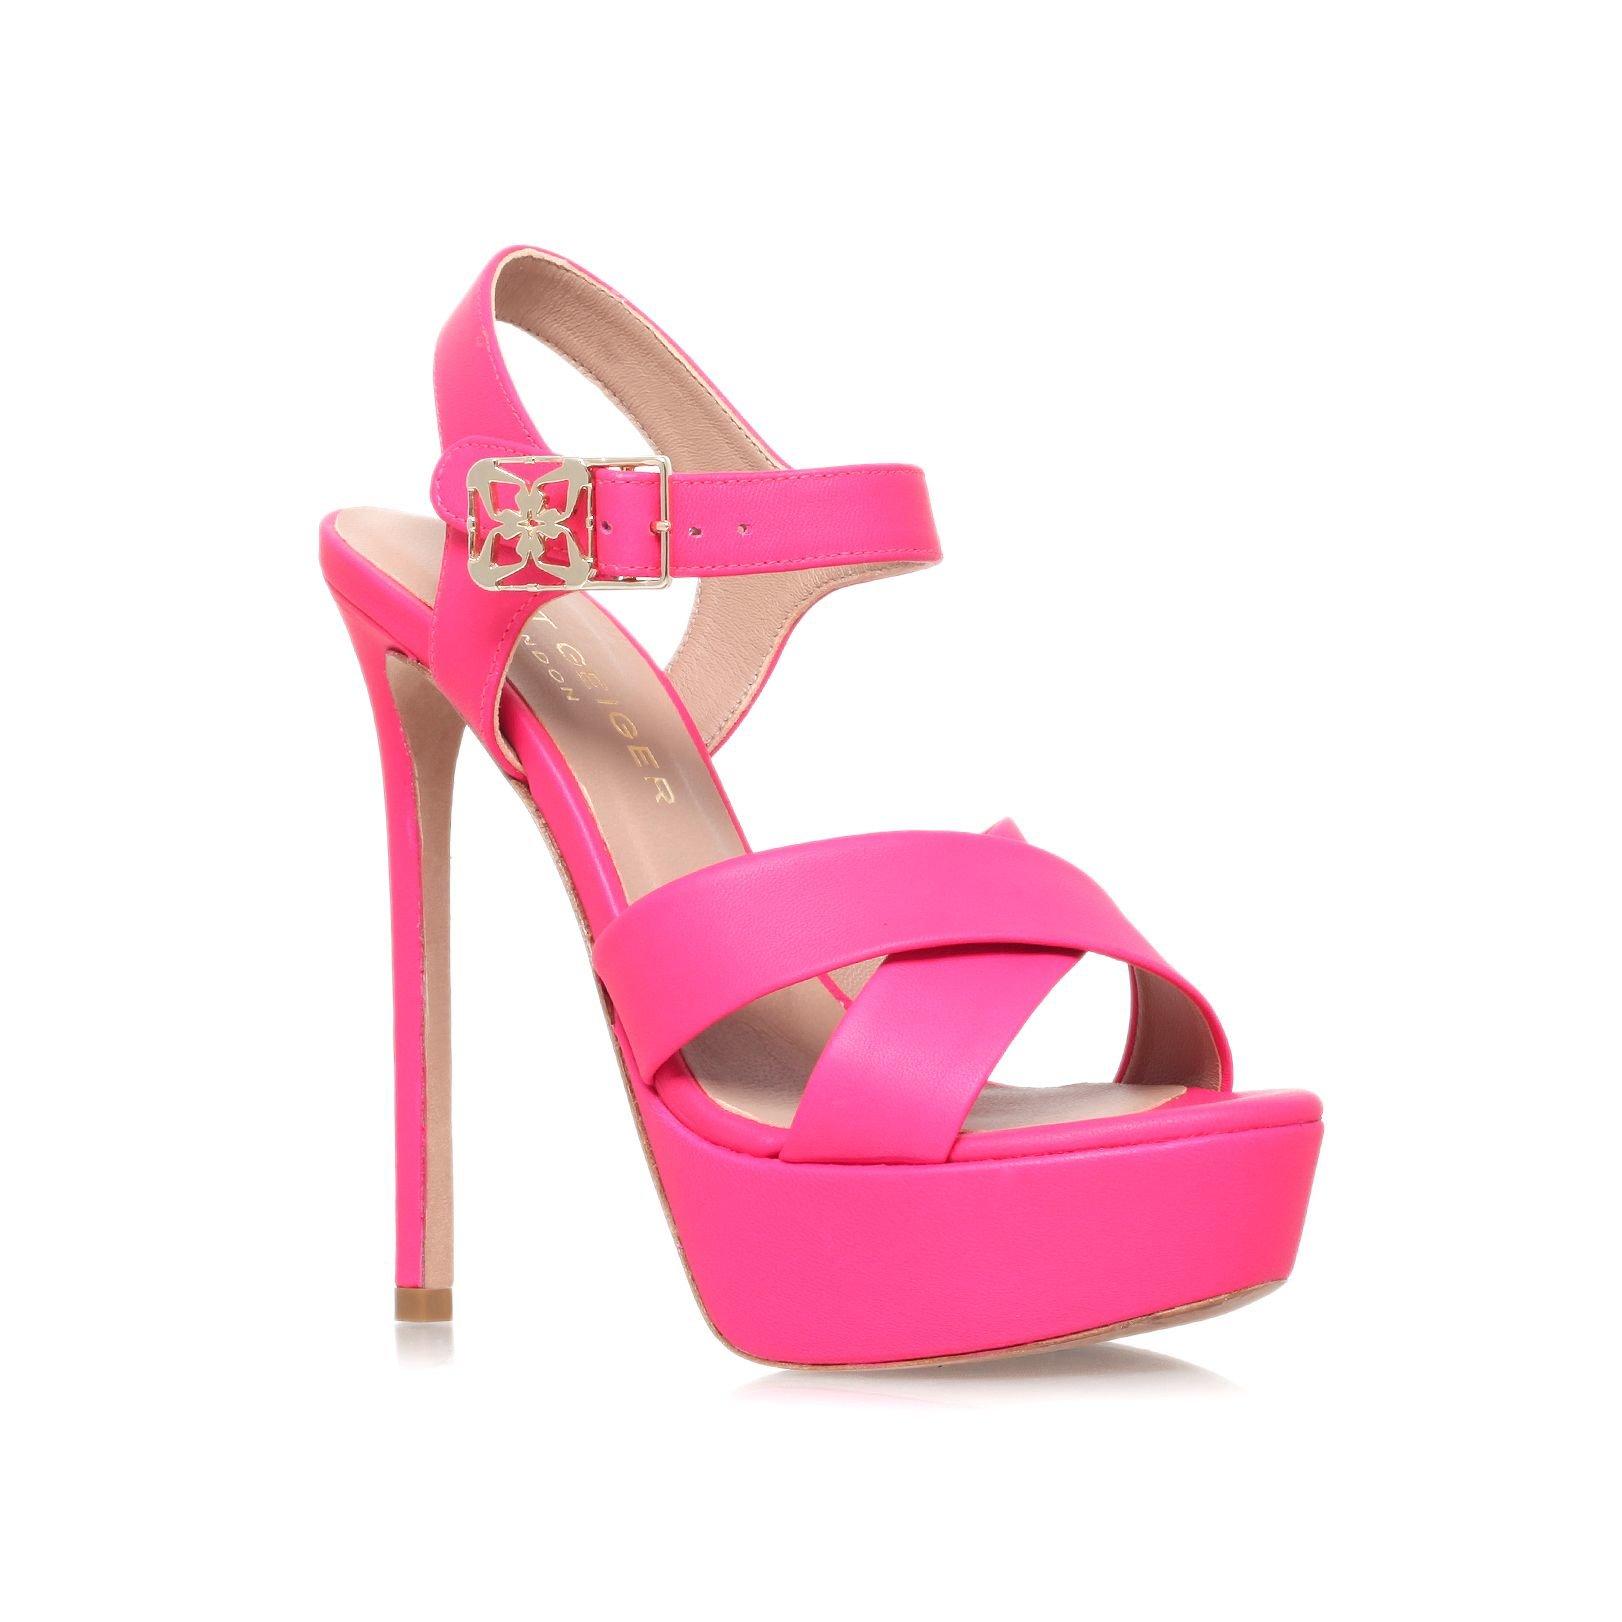 Kurt geiger Blossom High Heel Platform Sandals in Purple | Lyst